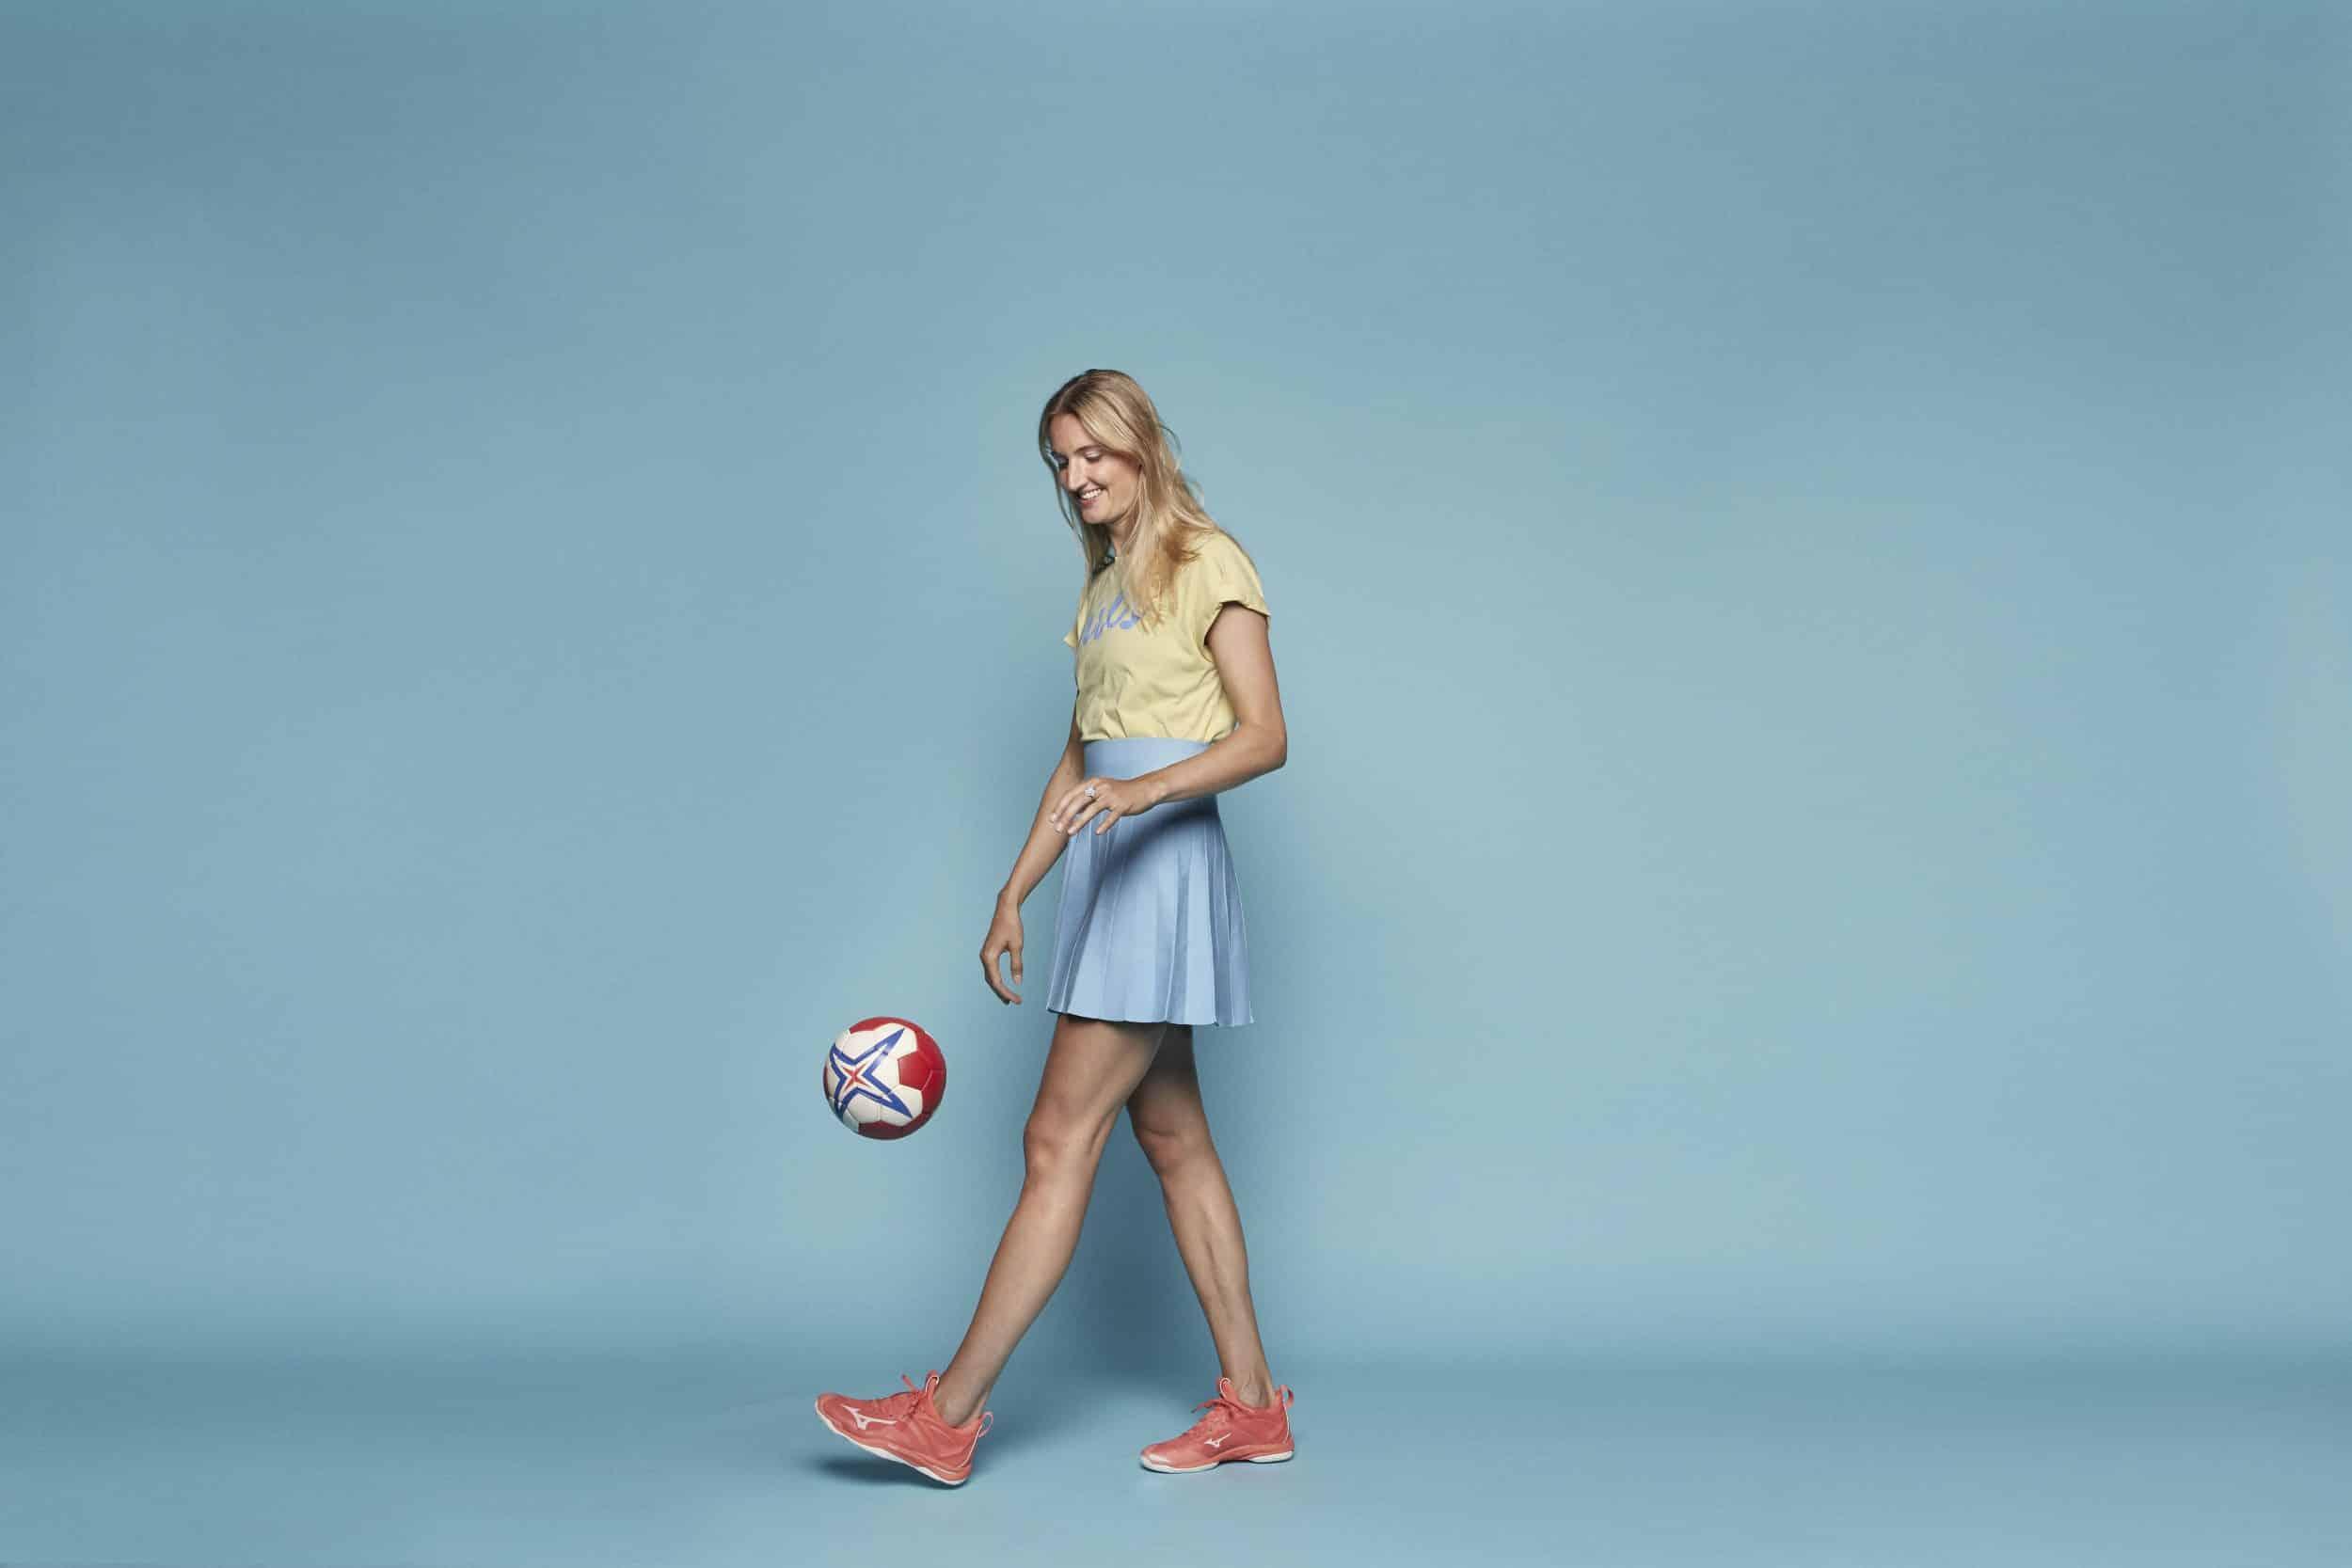 mizuno-handball-pack-show-your-colors-1